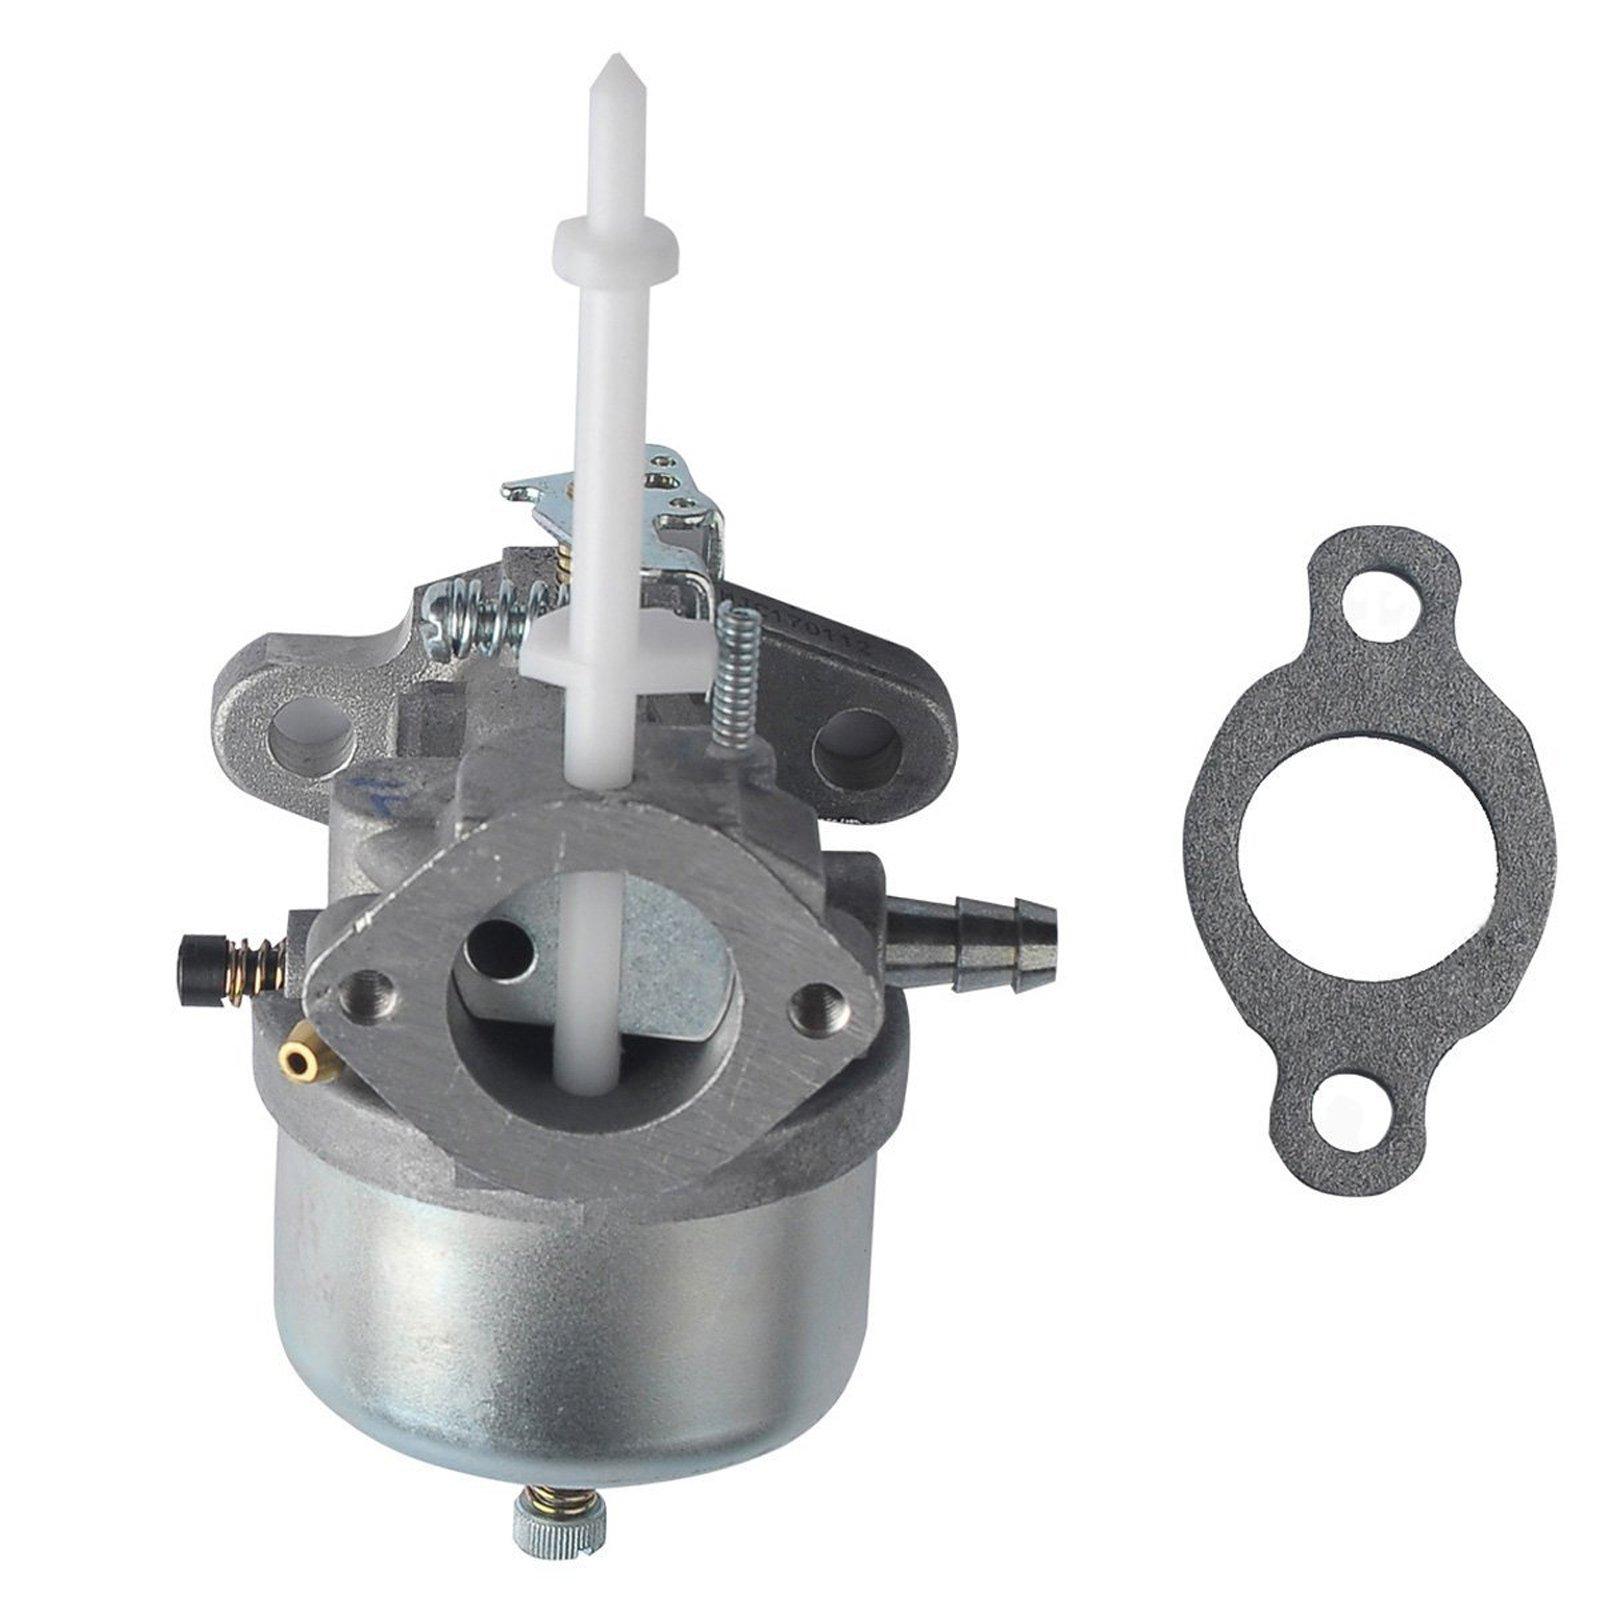 Tecumseh 632371A Carburetor attaches models HSK70-130294S HSK70-130291S